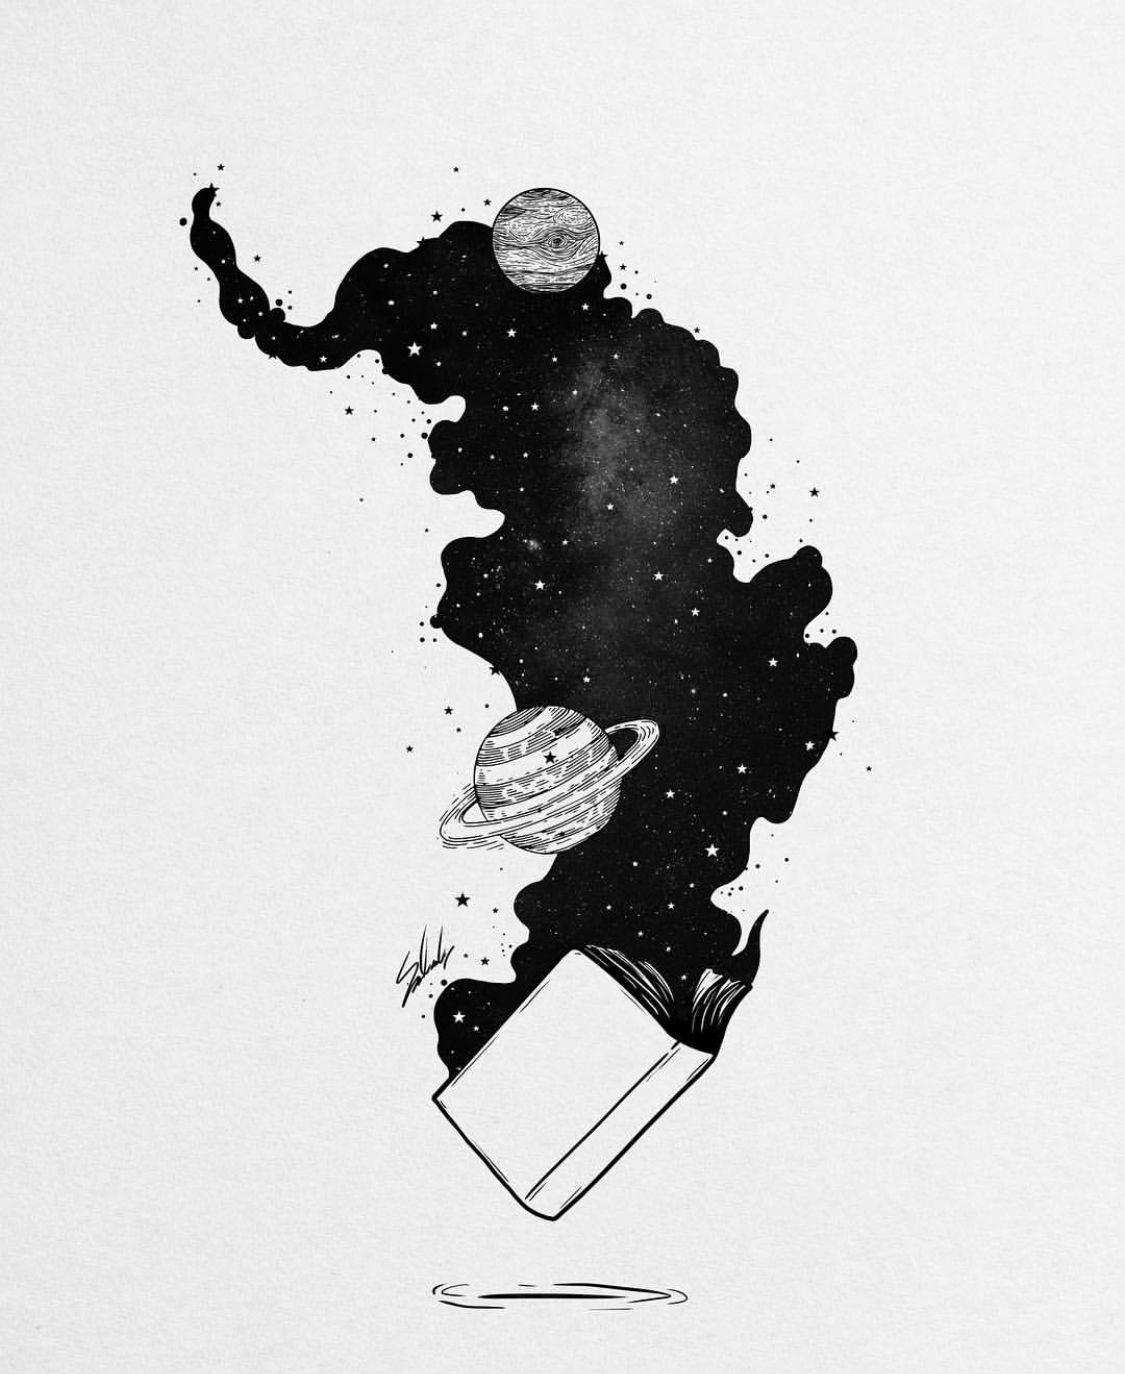 Pin by ibrahim brahovic on art Space drawings, Art drawings